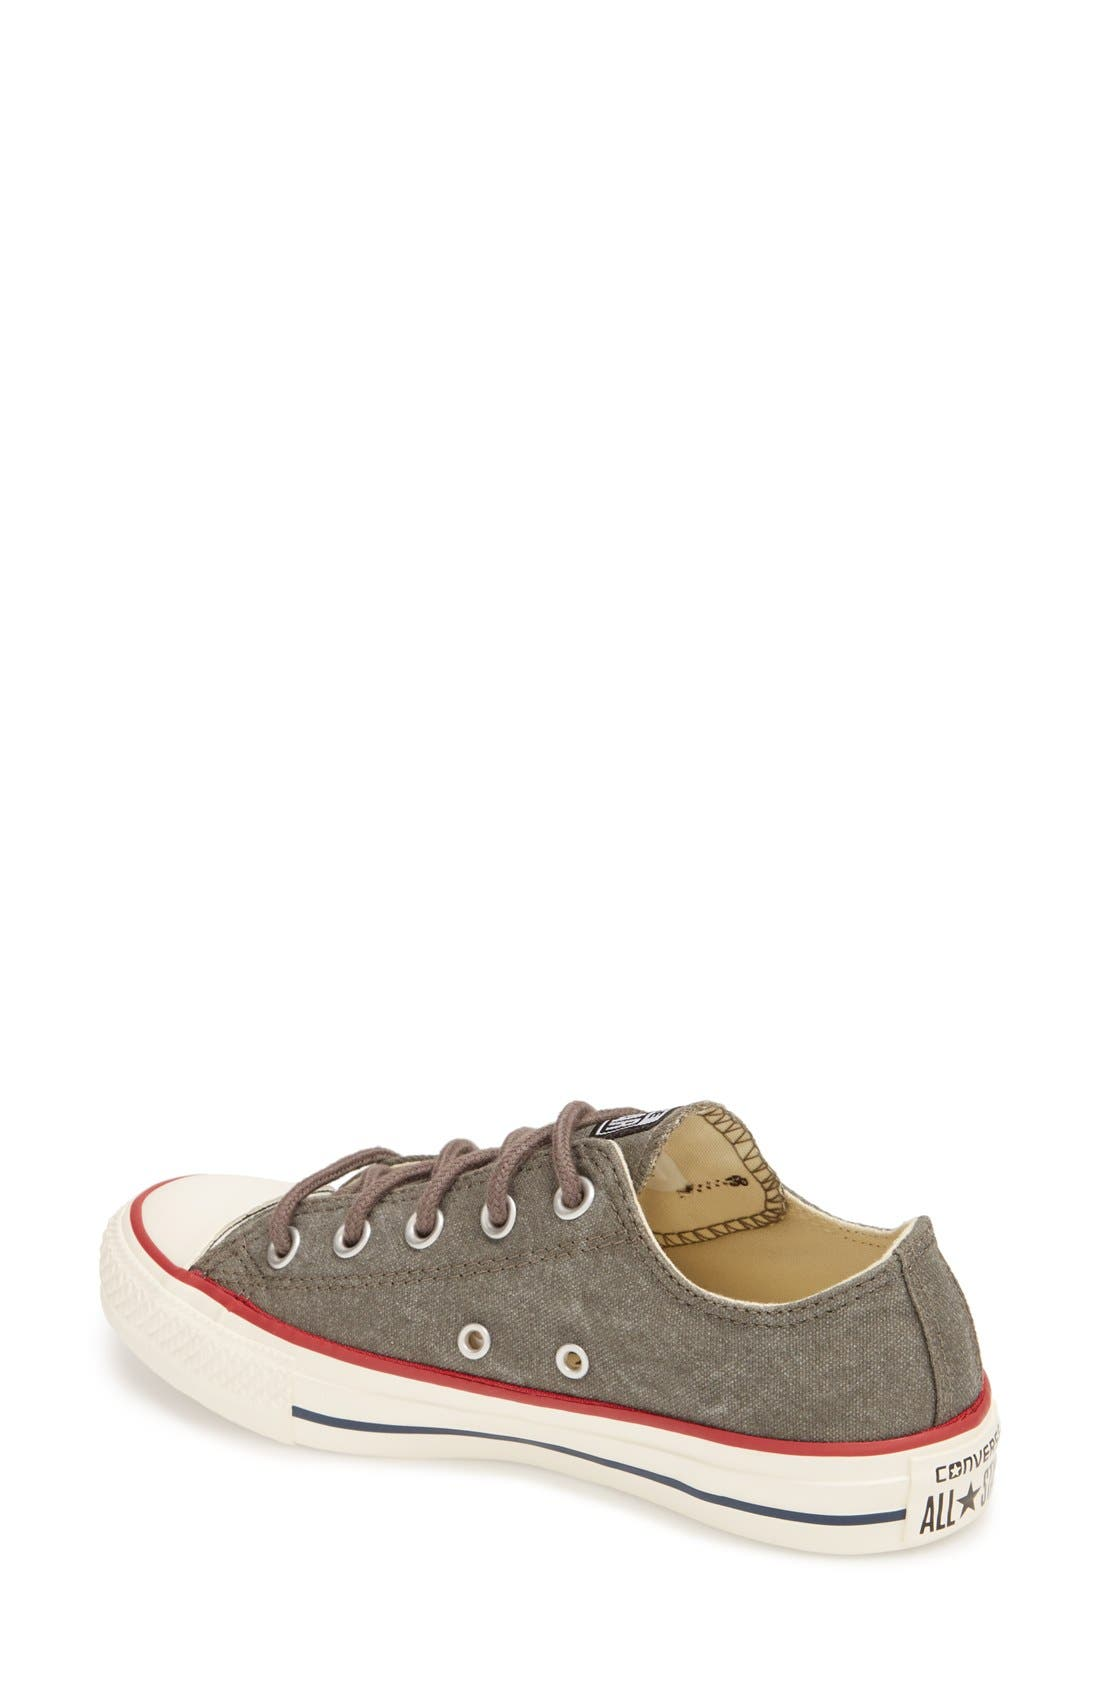 Alternate Image 2  - Converse Chuck Taylor® All Star® 'Ox' Canvas Sneaker (Women)